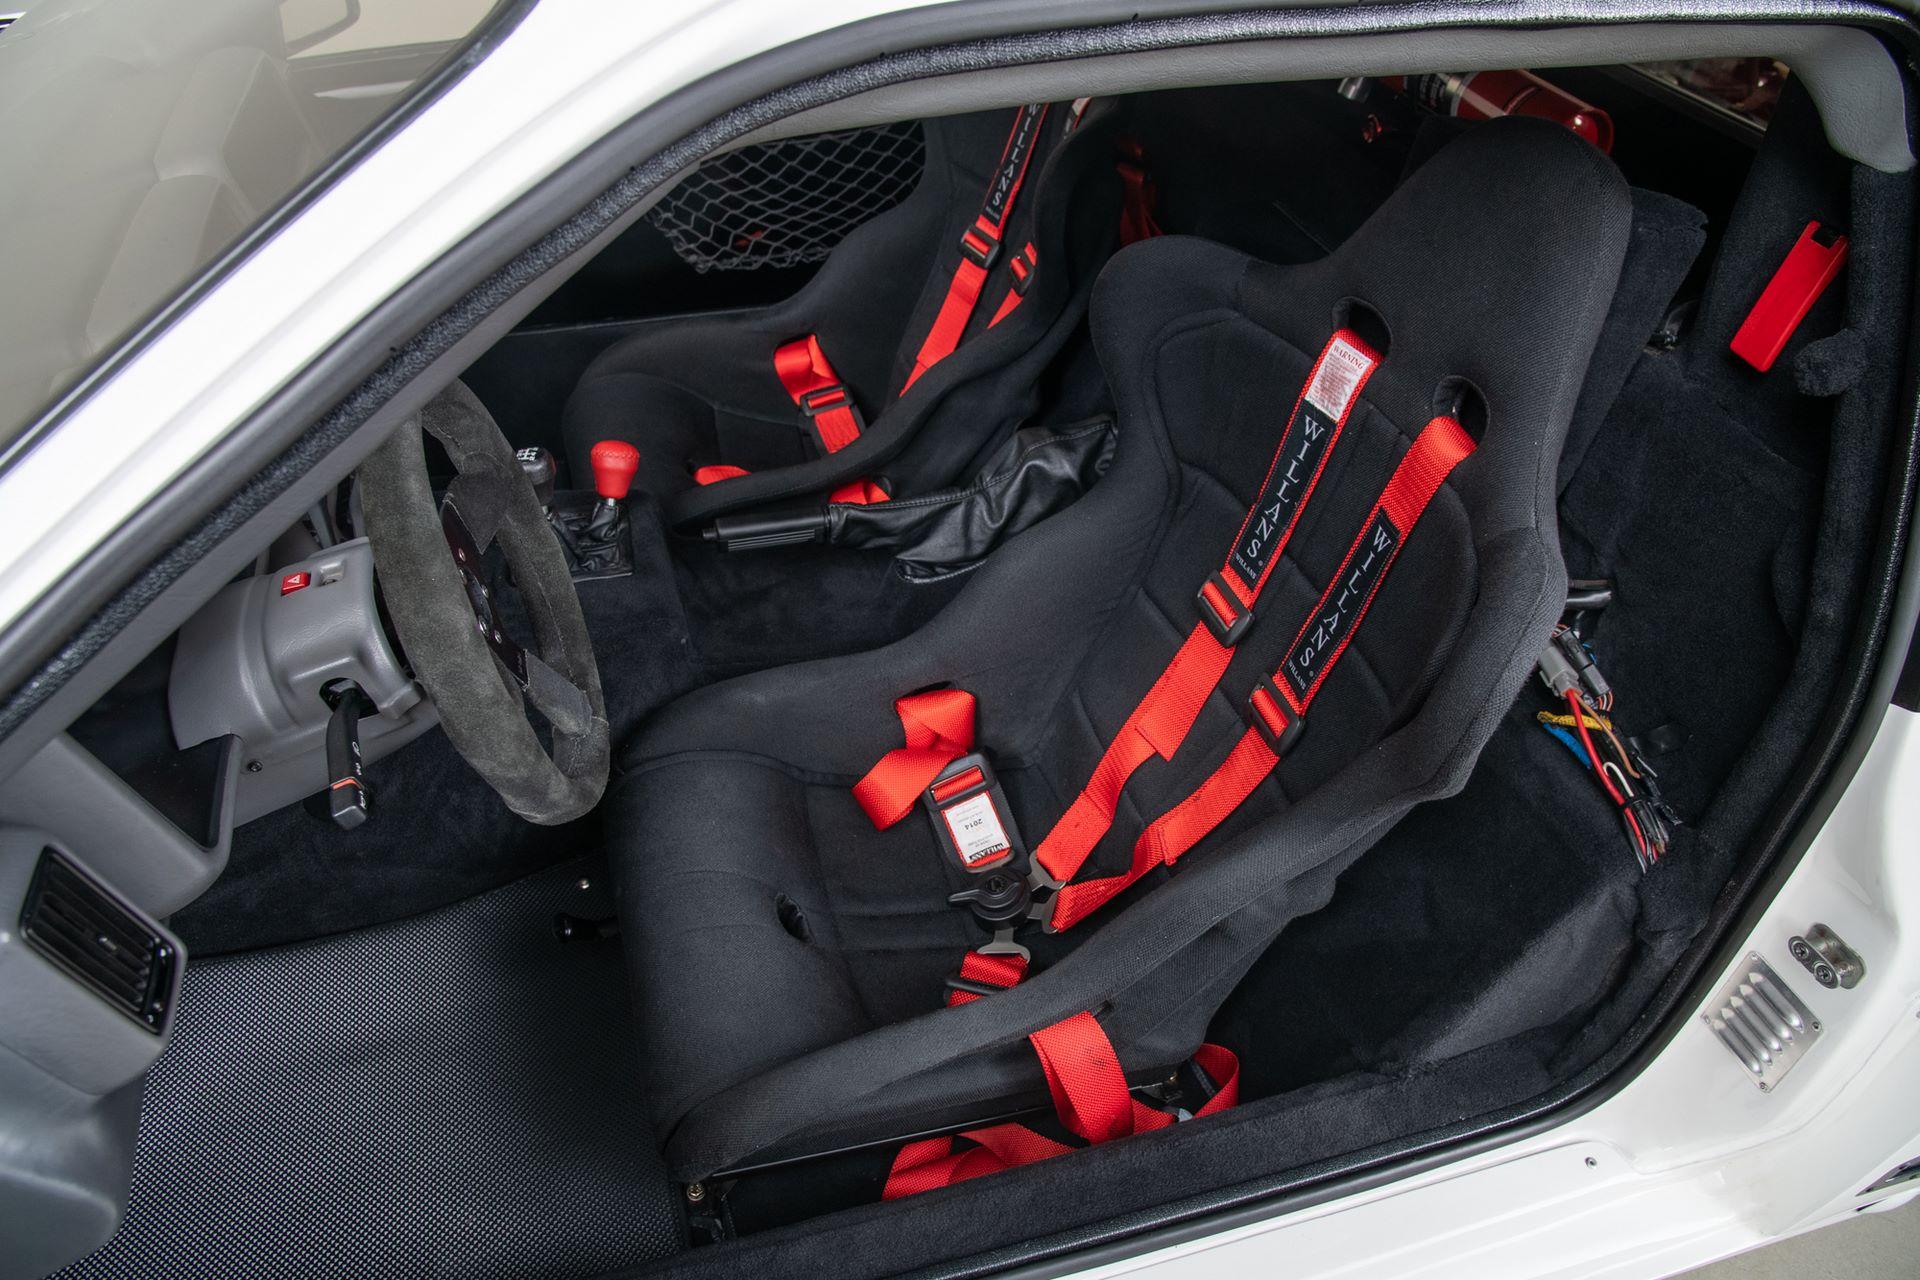 Ford-RS200-Evolution-Evo-for-sale-17